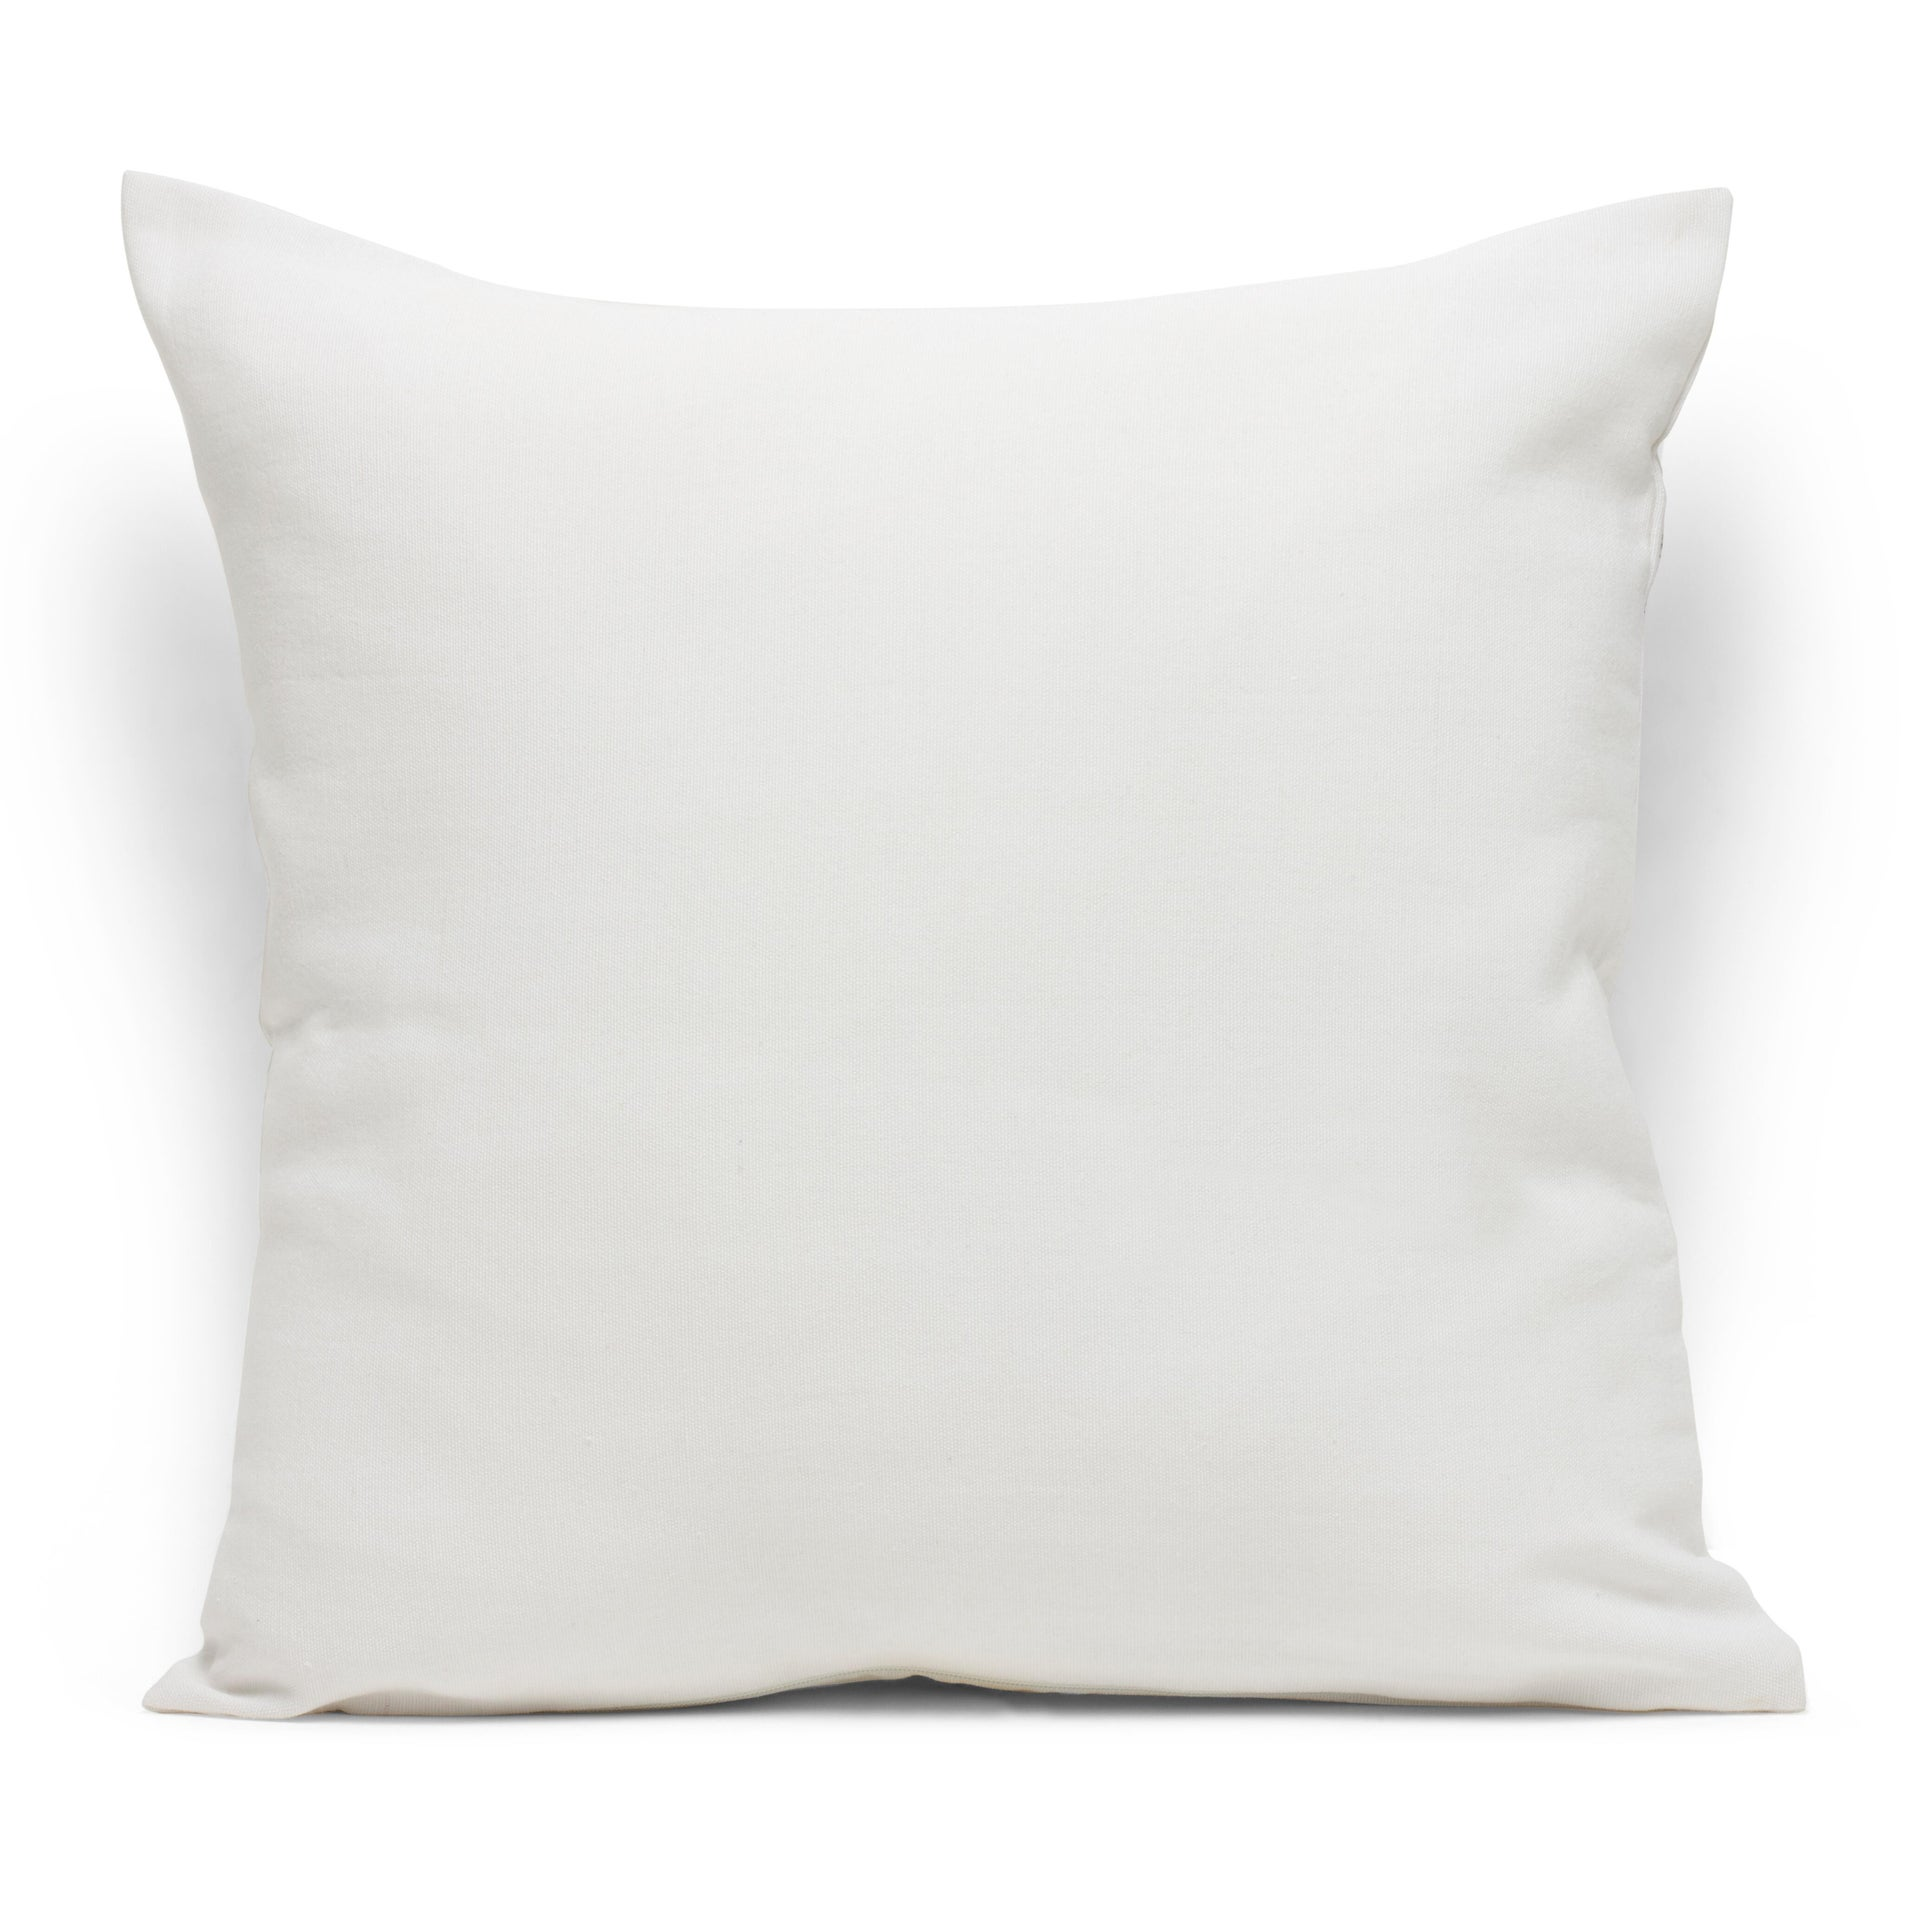 Cuscino INSPIRE Lea bianco 40x40 cm - 1